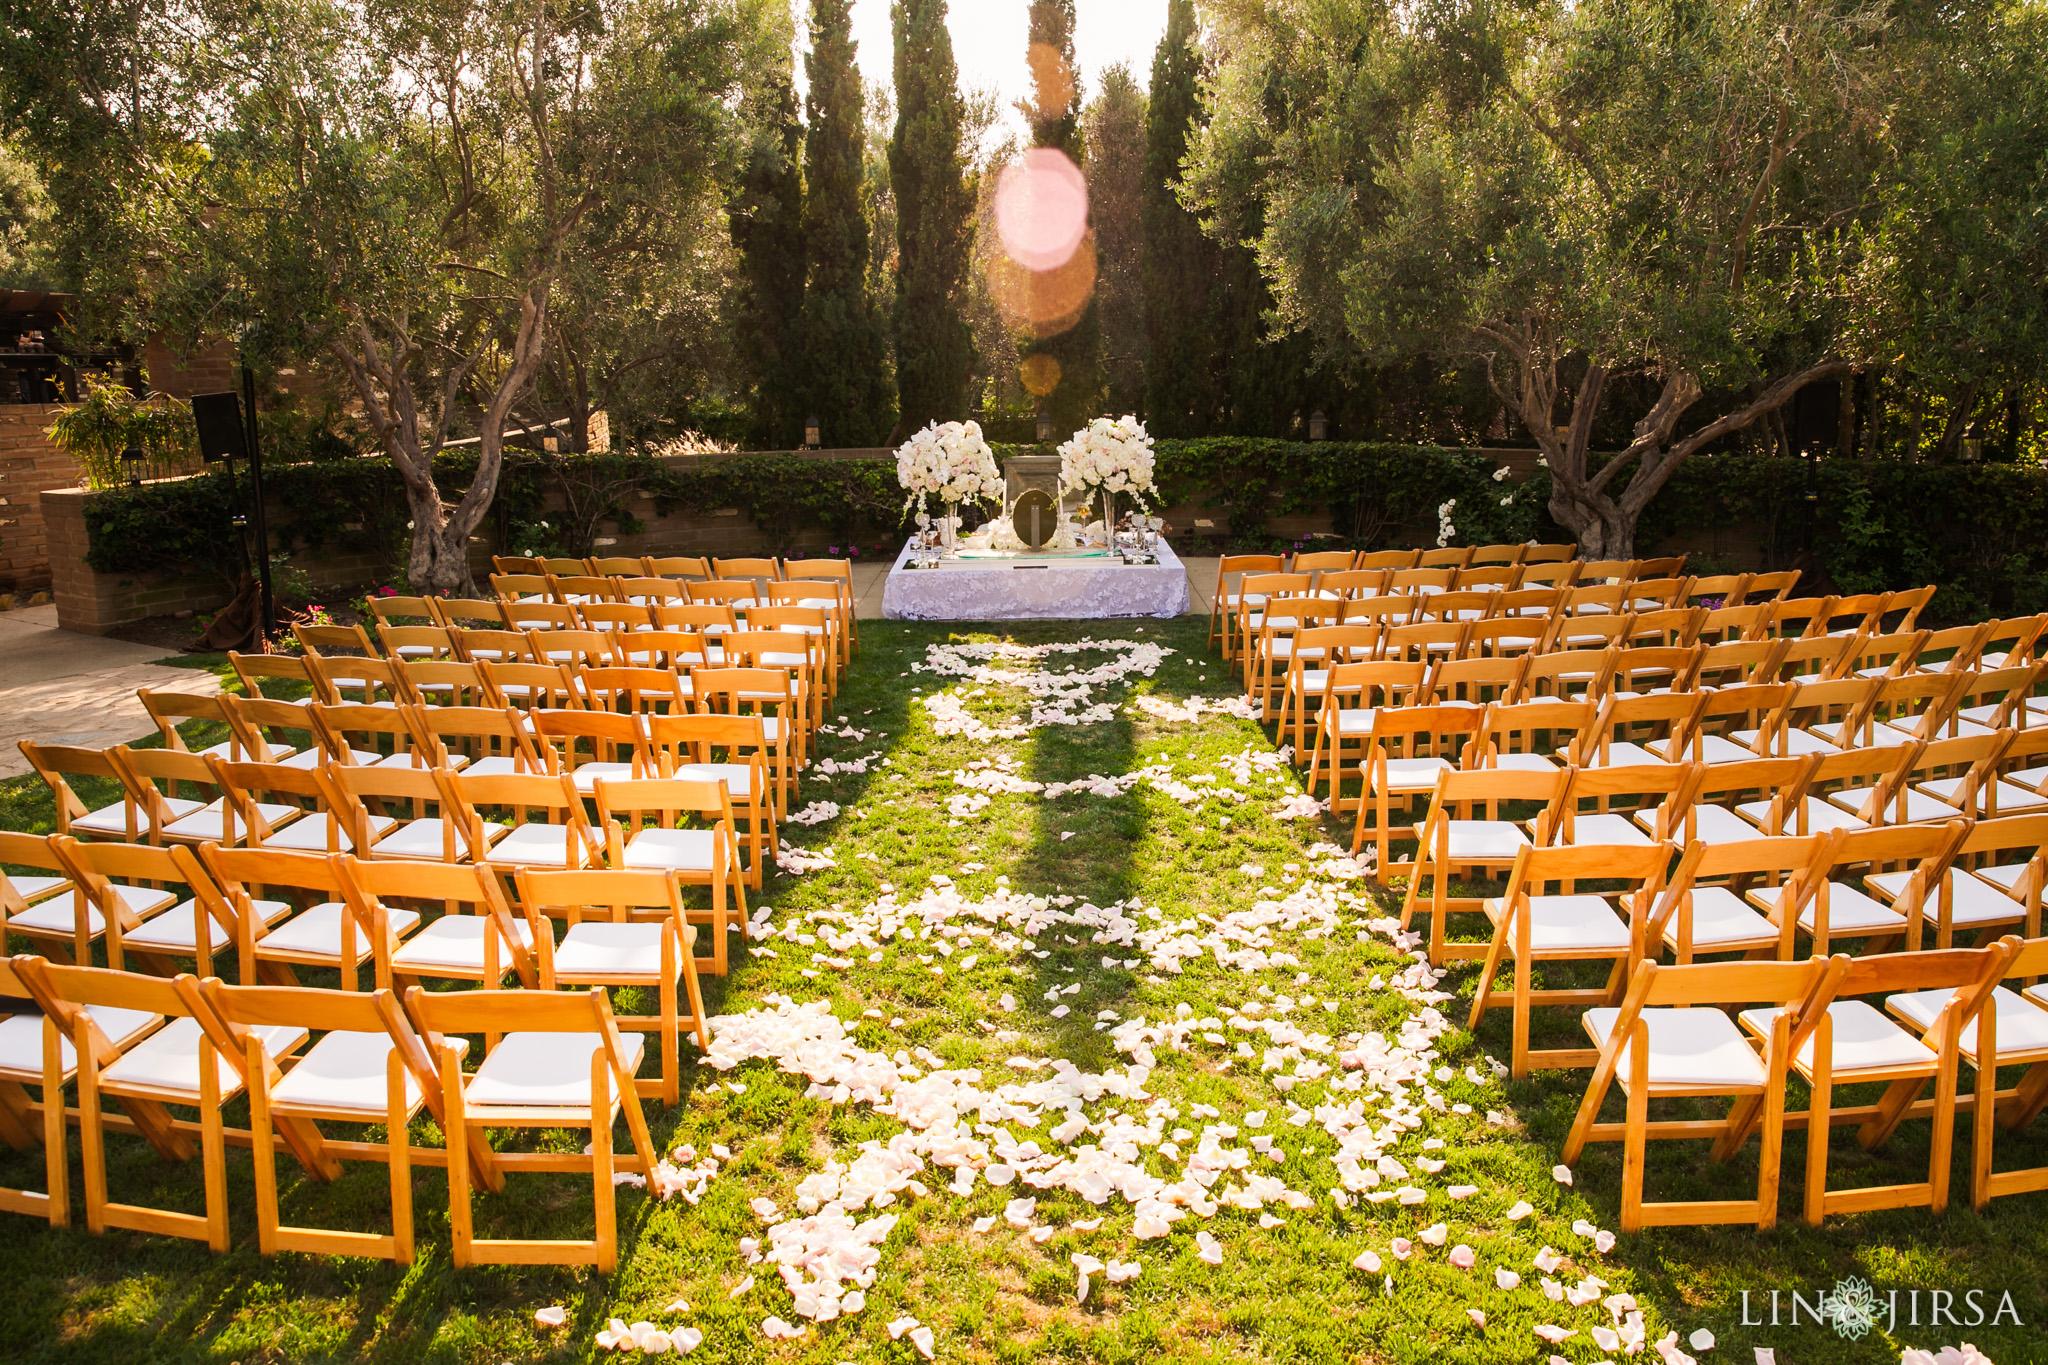 027 estancia la jolla hotel spa persian sofreh wedding ceremony photography